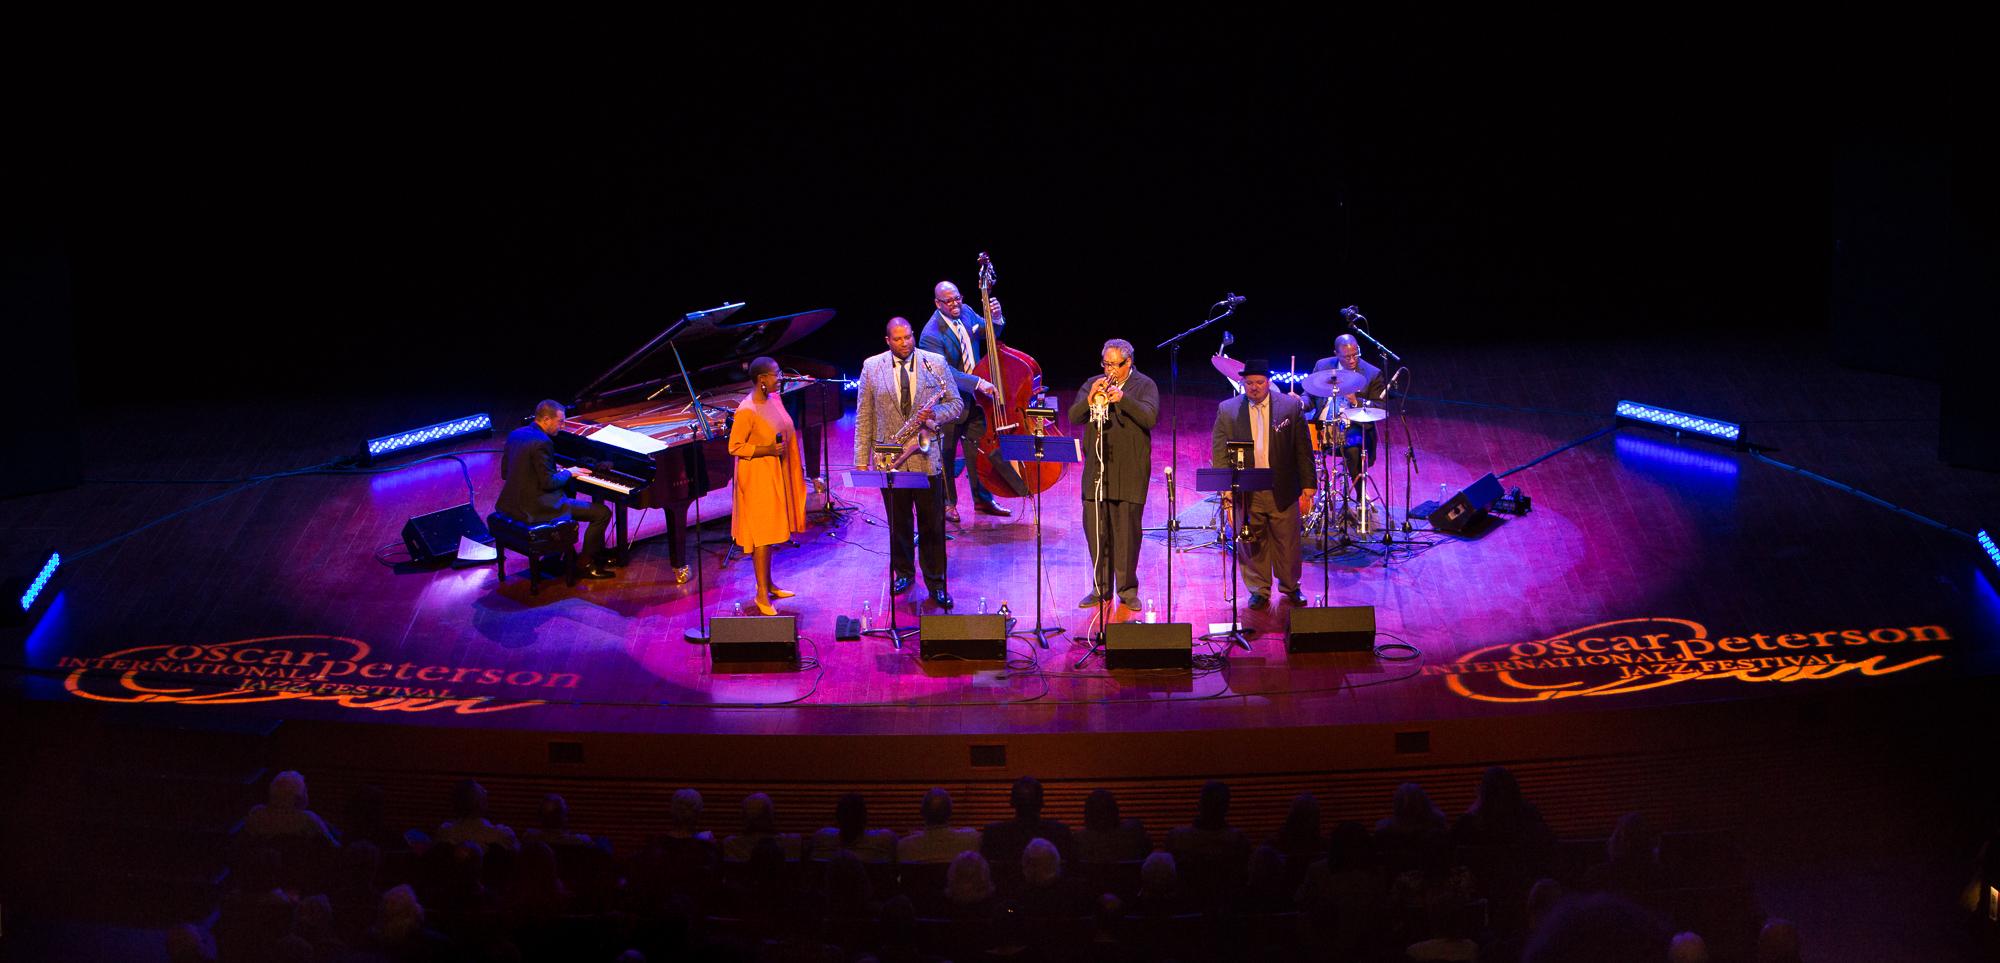 Oscar Peterson Jazz Festival 2018 (C) Alex Heidbuechel-3635.jpg